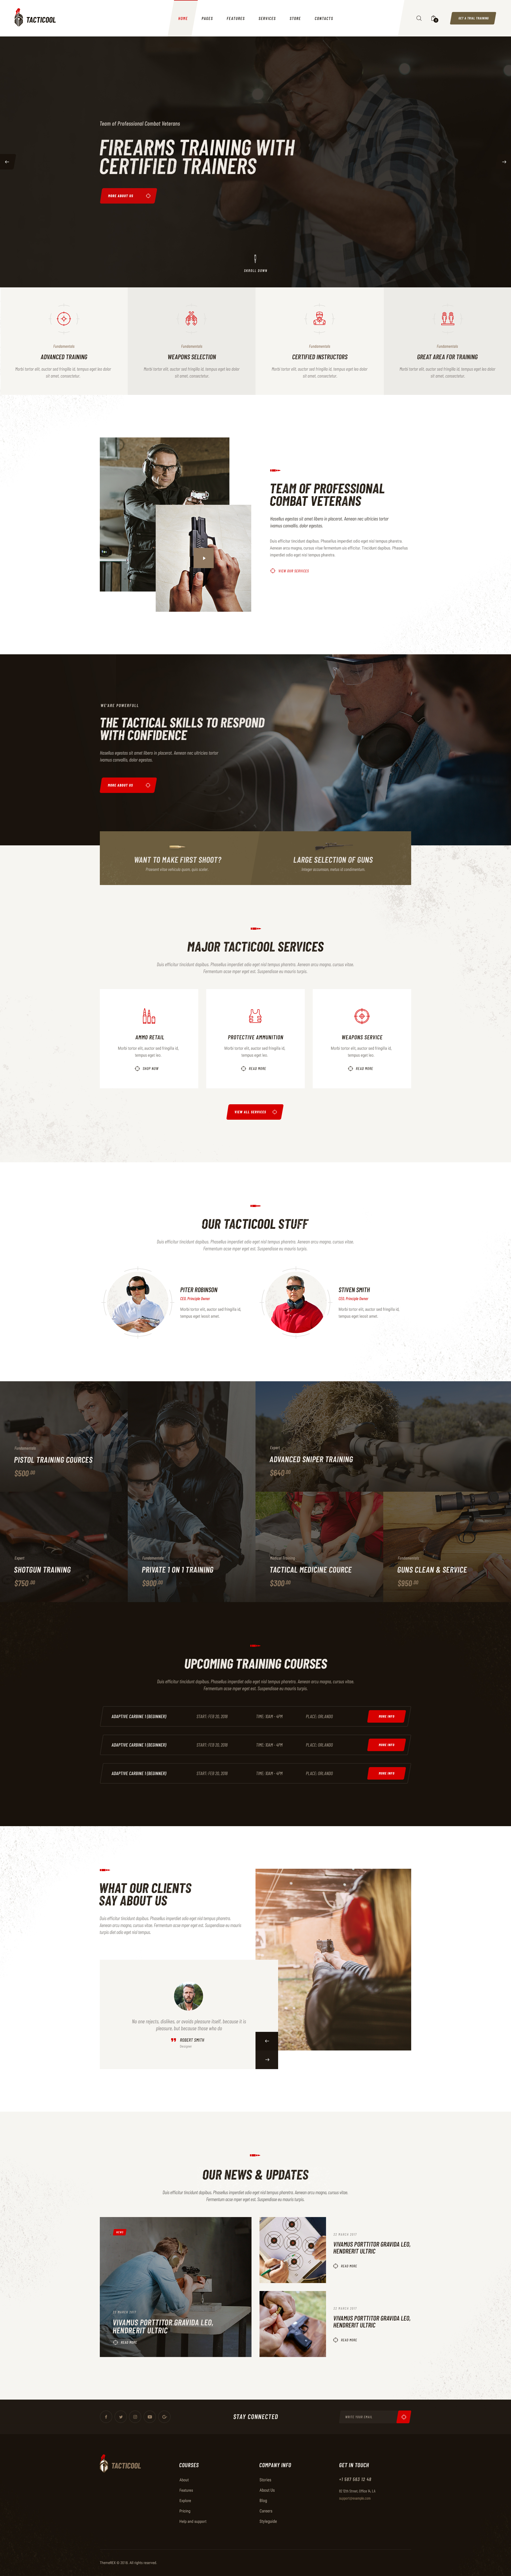 Tacticool Shooting Range Gun Store Wordpress Theme By Axiomthemes